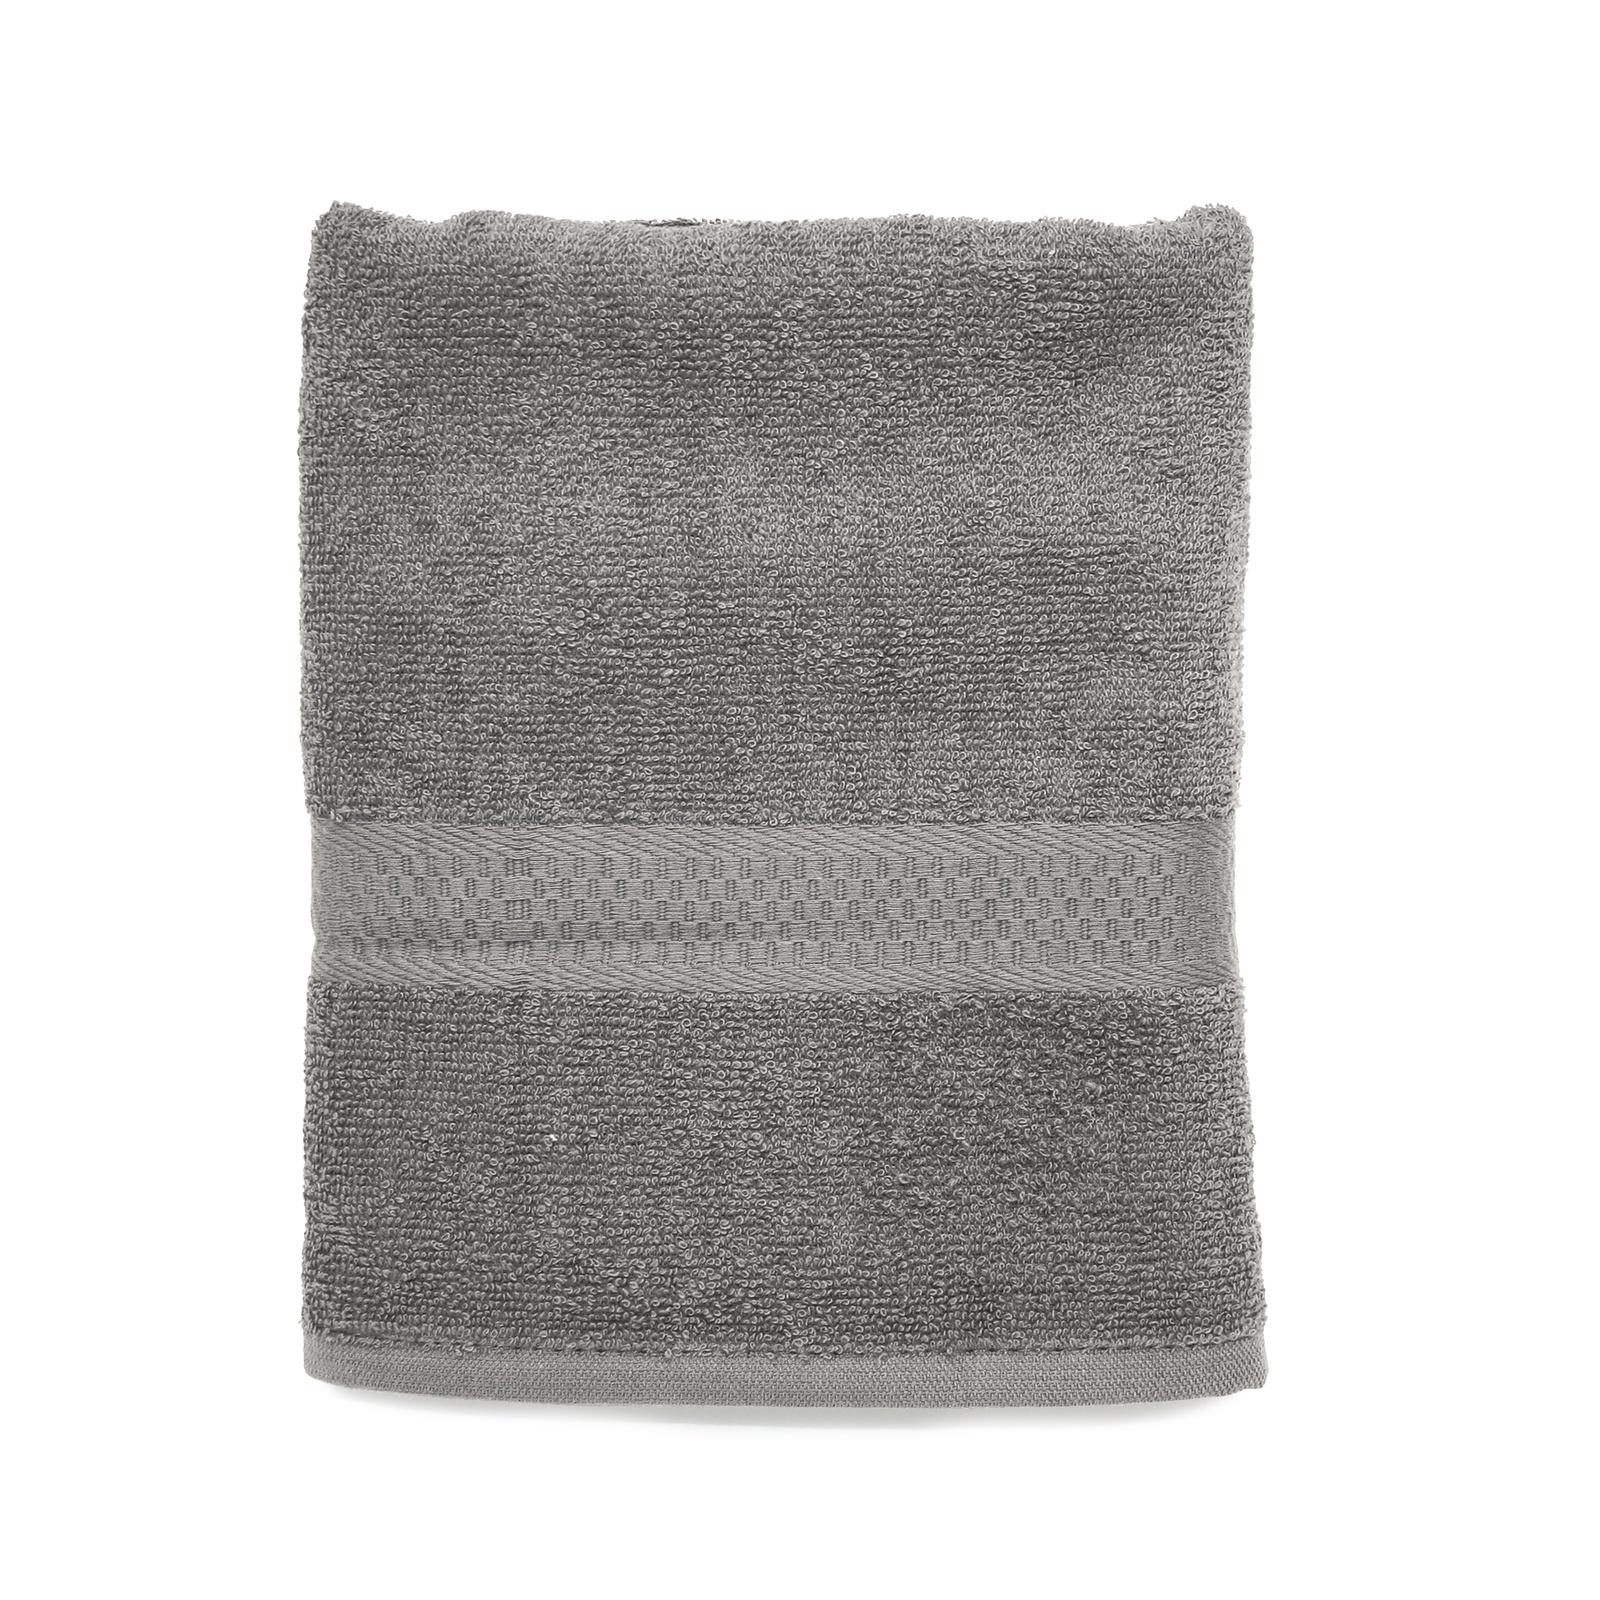 Полотенце банное Spany, 21311318186, махровое, серый, 50 х 90 см полотенце банное fiesta arabesca 50 90 см